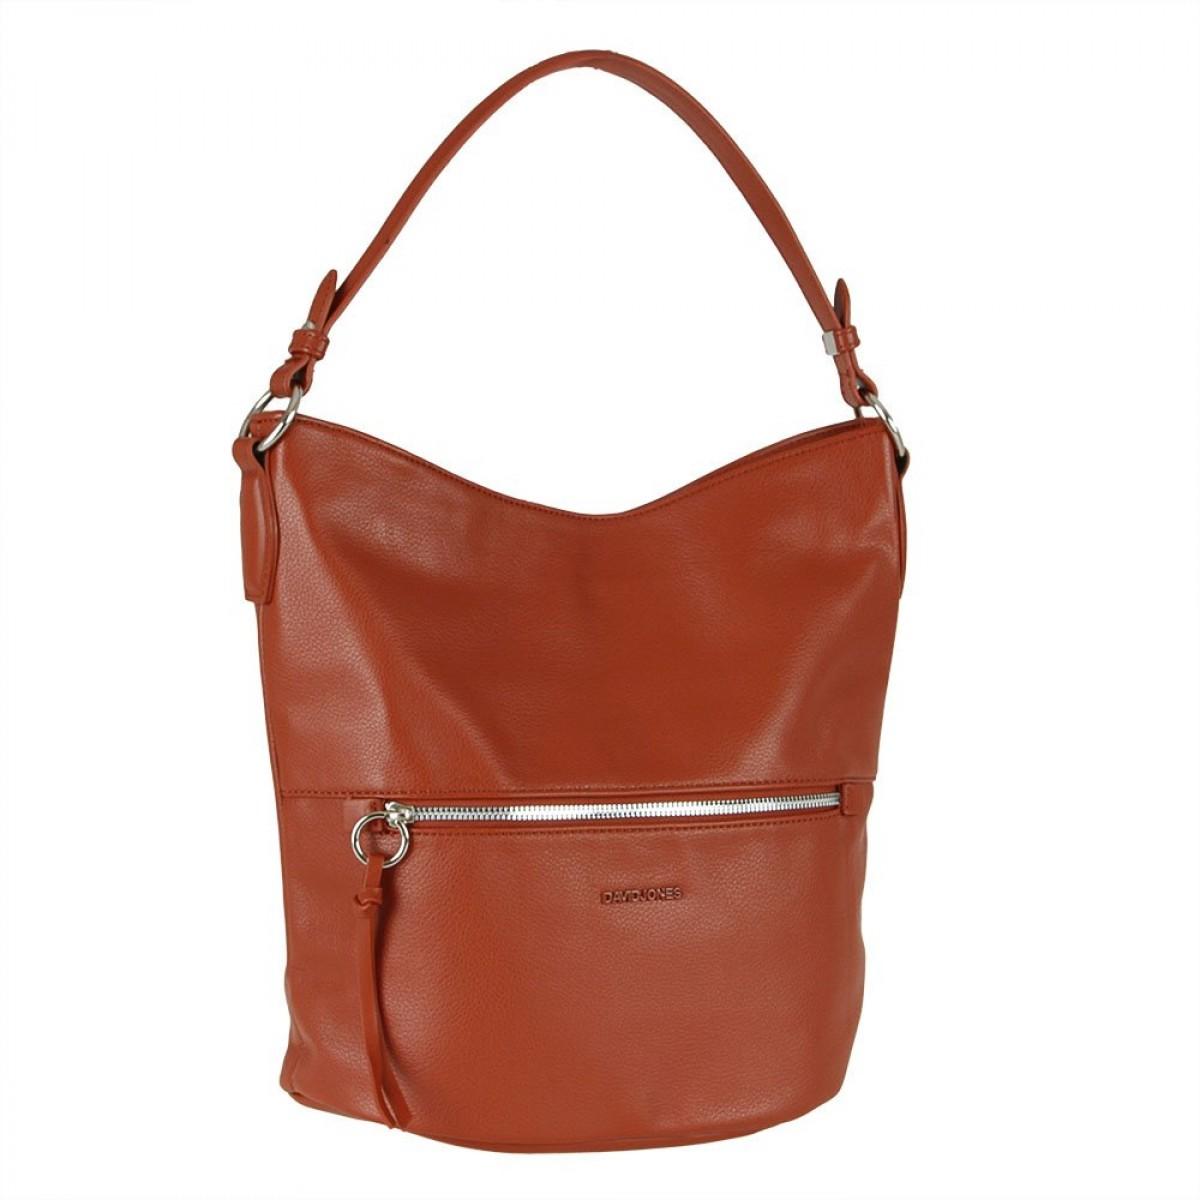 Жіноча сумка David Jones 6422-1 SIENNA